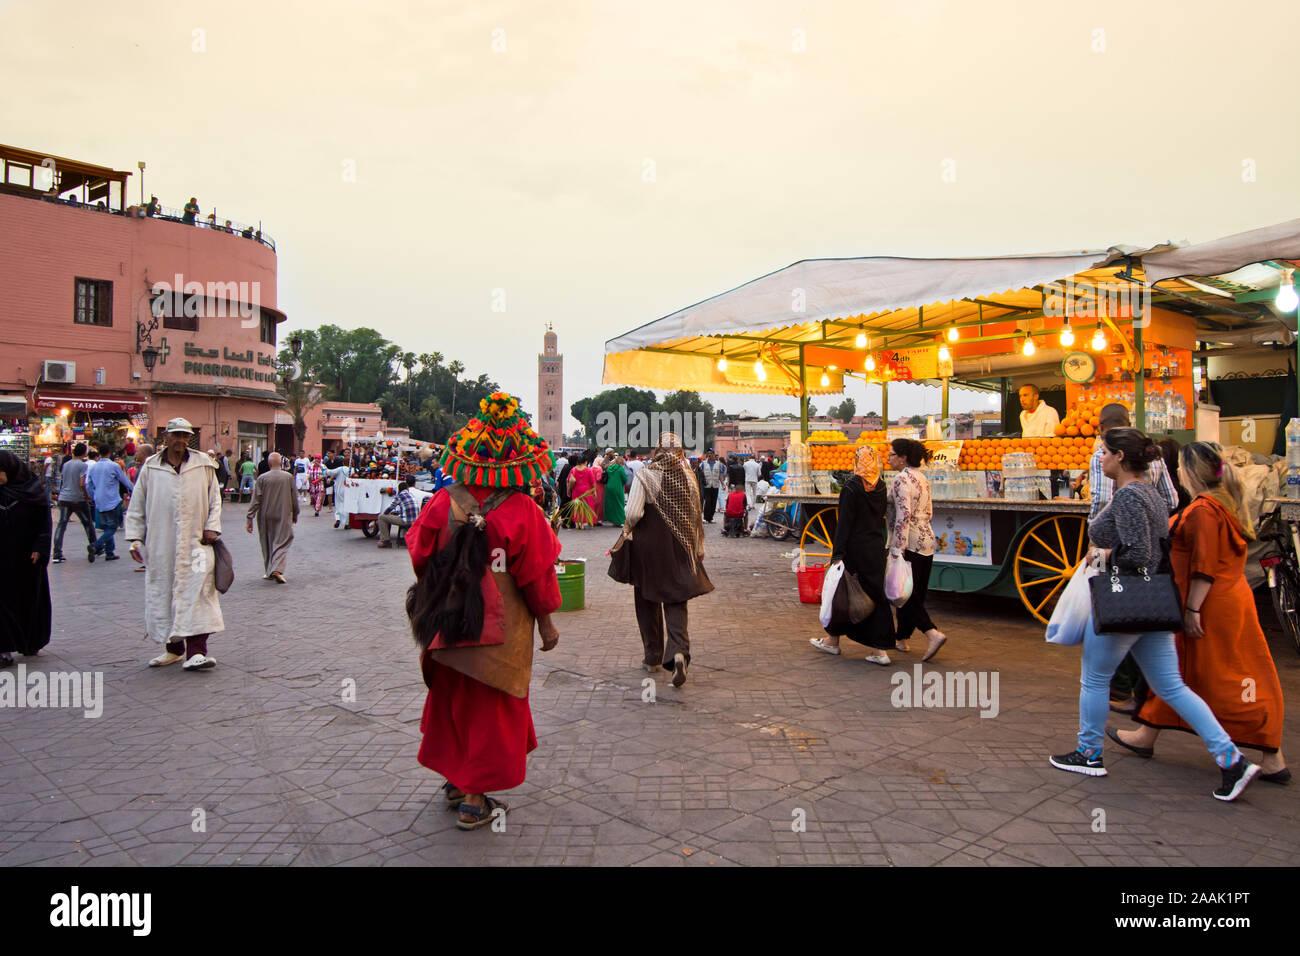 Stalls selling freshly squeezed orange juice. Djemaa el-Fna Square, Marrakech. Morocco - Stock Photo